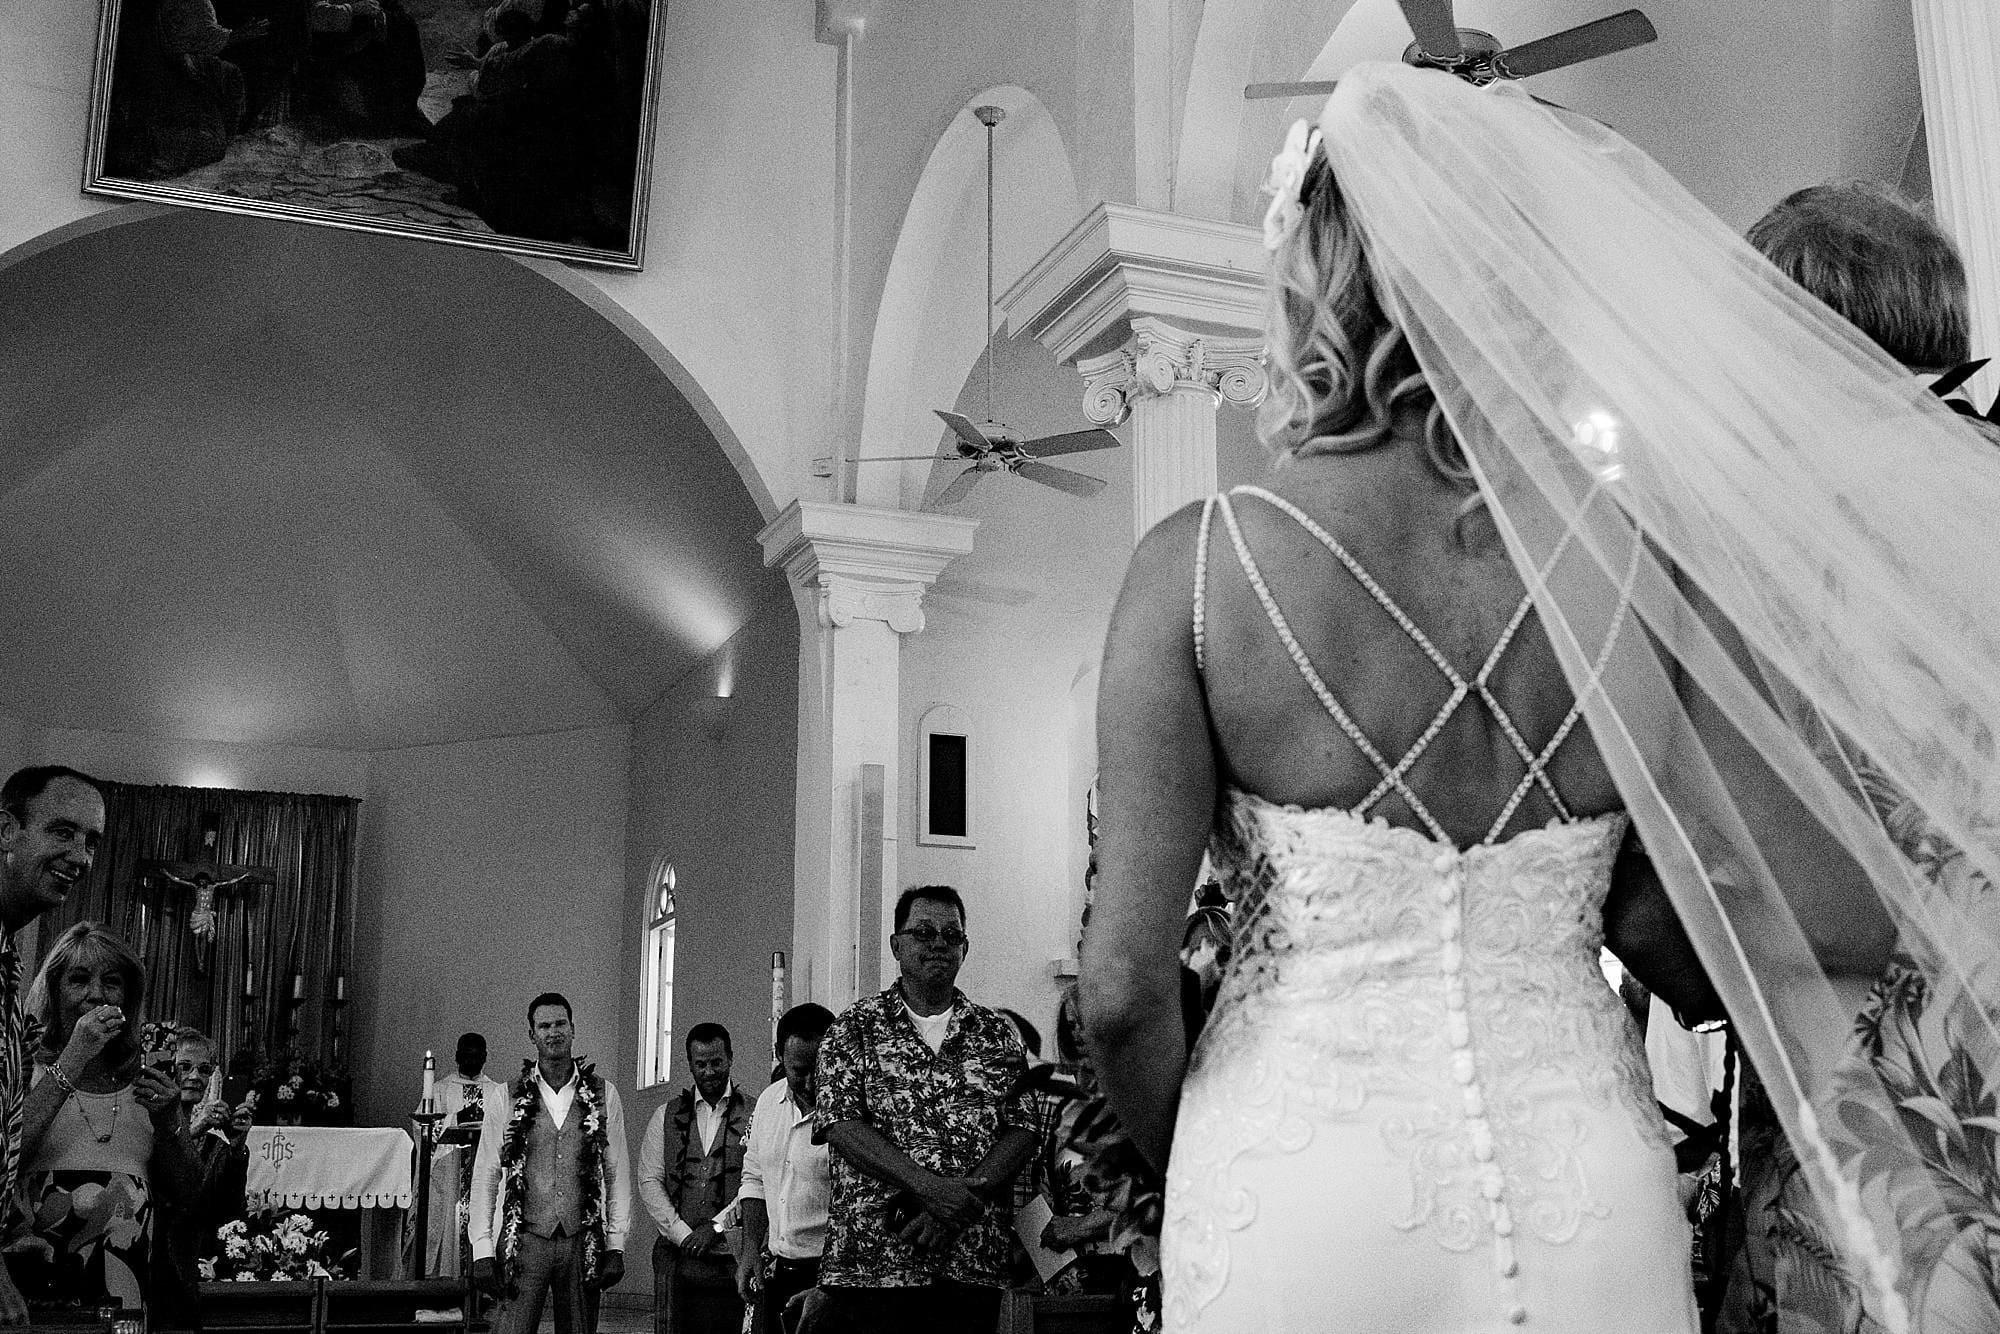 maui wedding at maria lanikila church